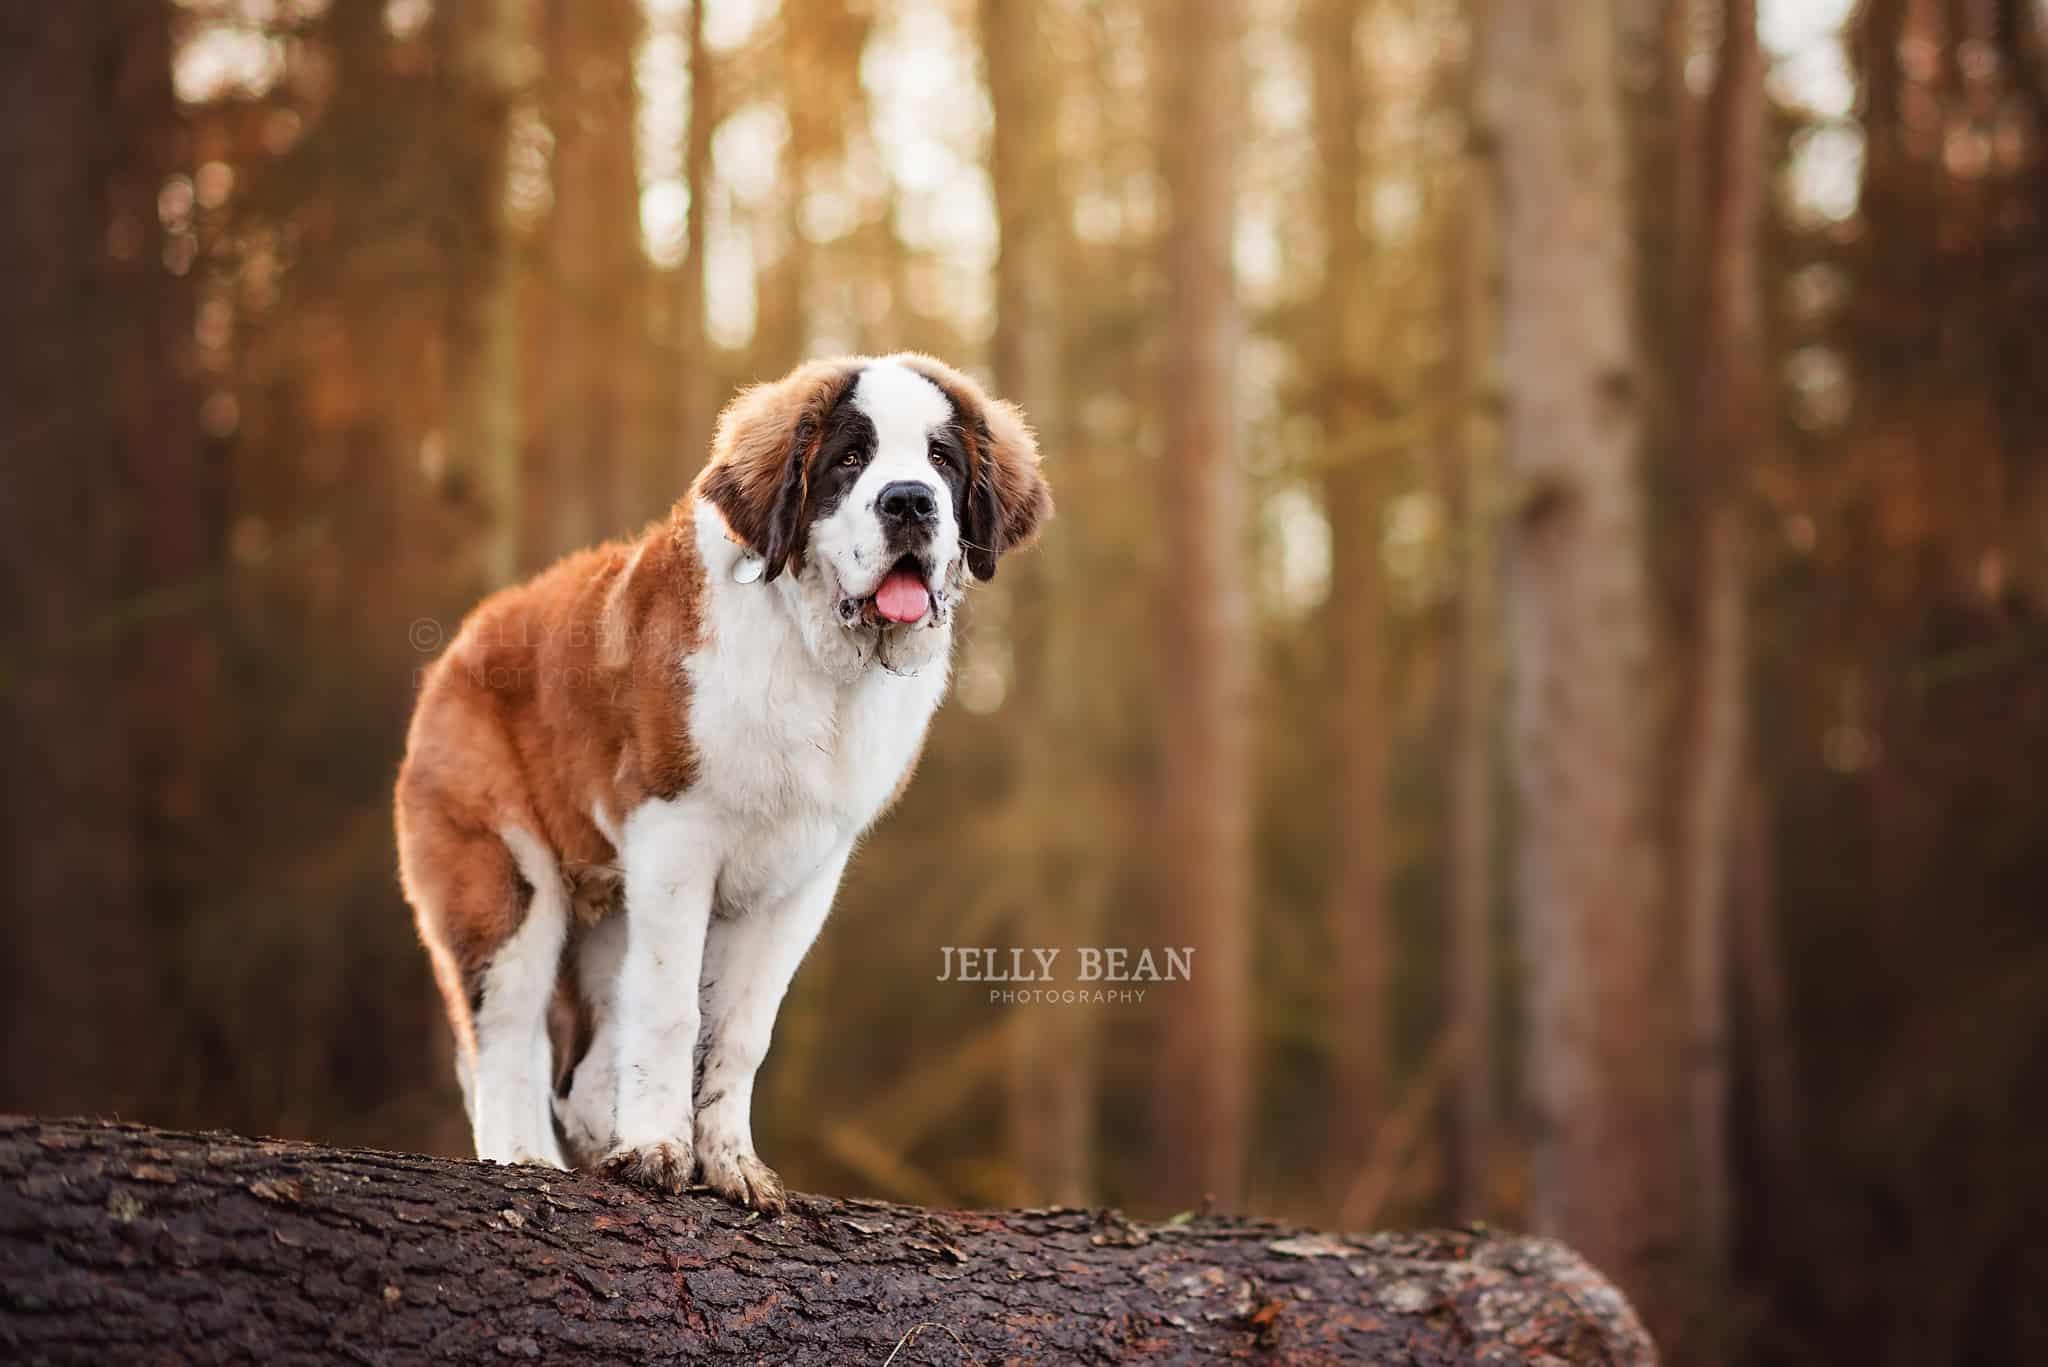 Big puppy standing on log